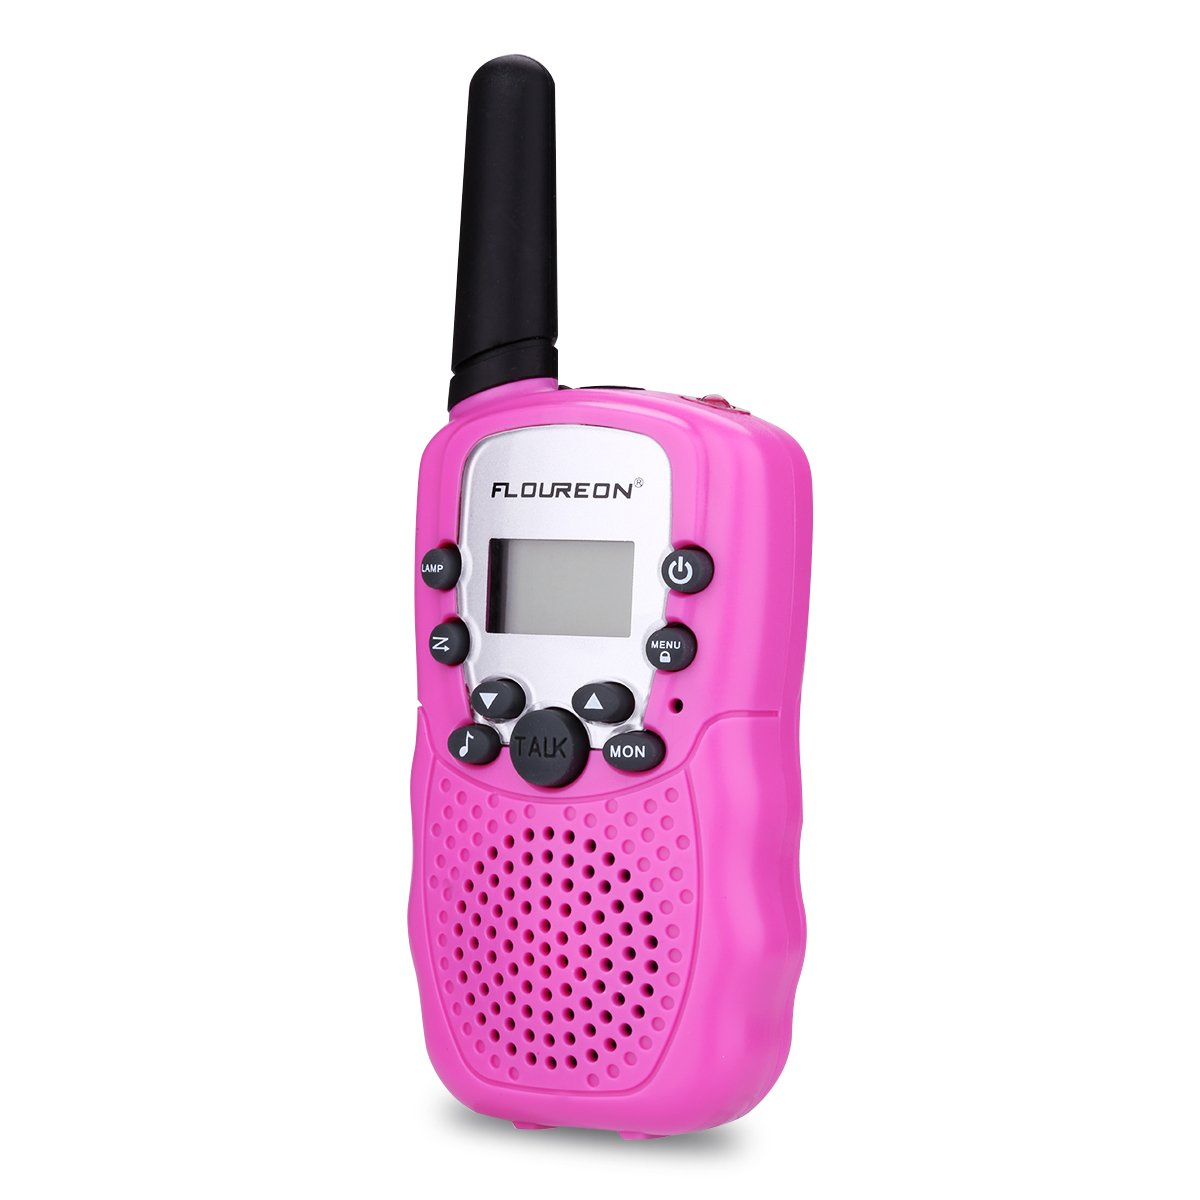 FLOUREON Walkie Talkies for Kids, Two Way Radio Toys 8 Channels Long Distance Range 2Pcs Interphone Pink